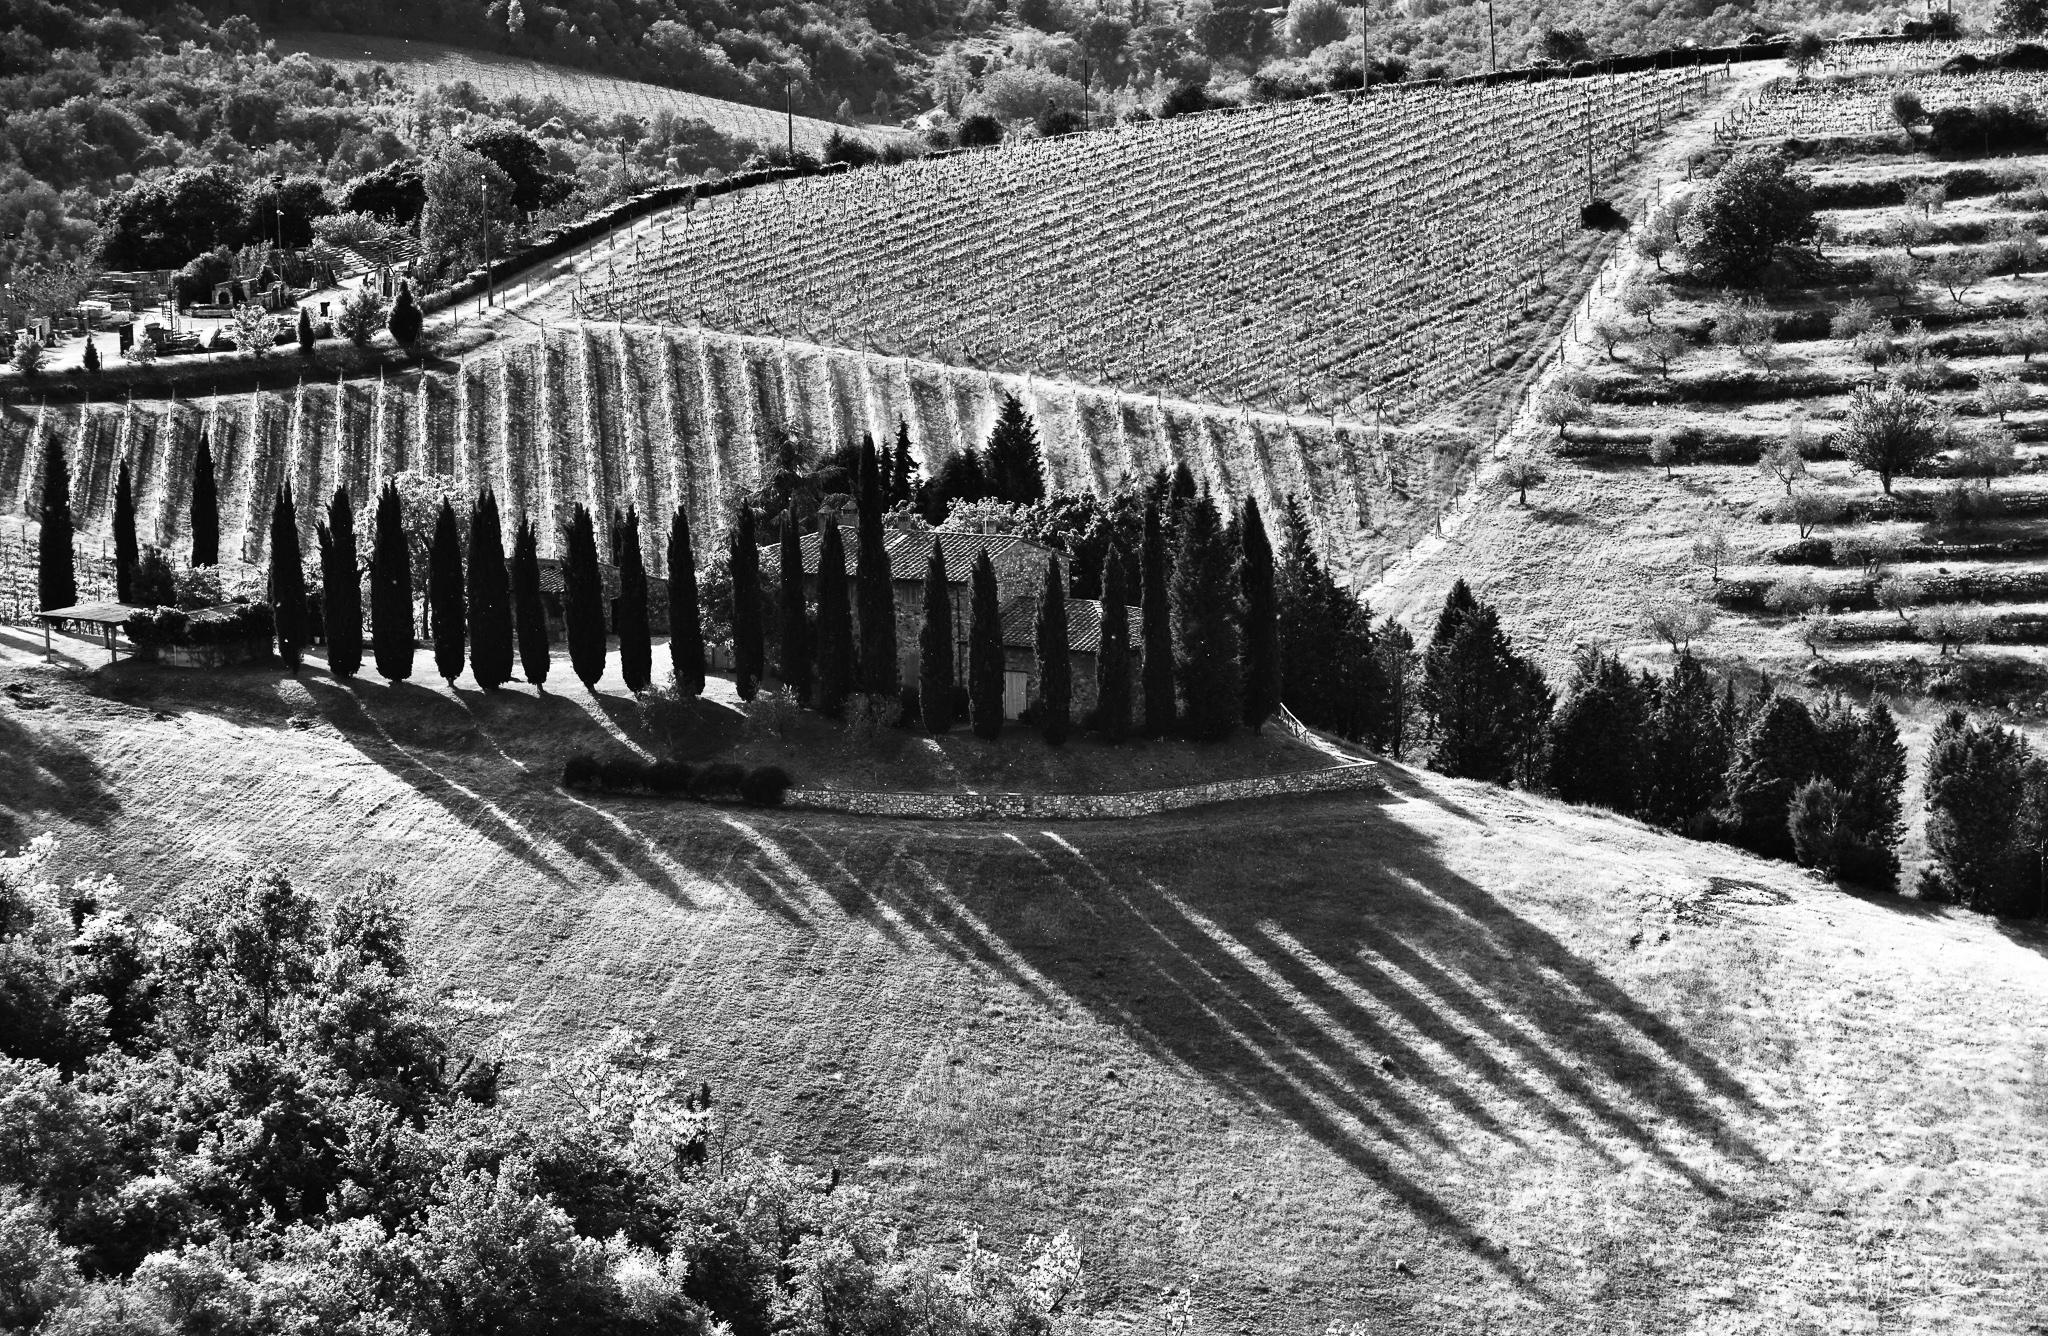 Chianti vineyard valley, Italy